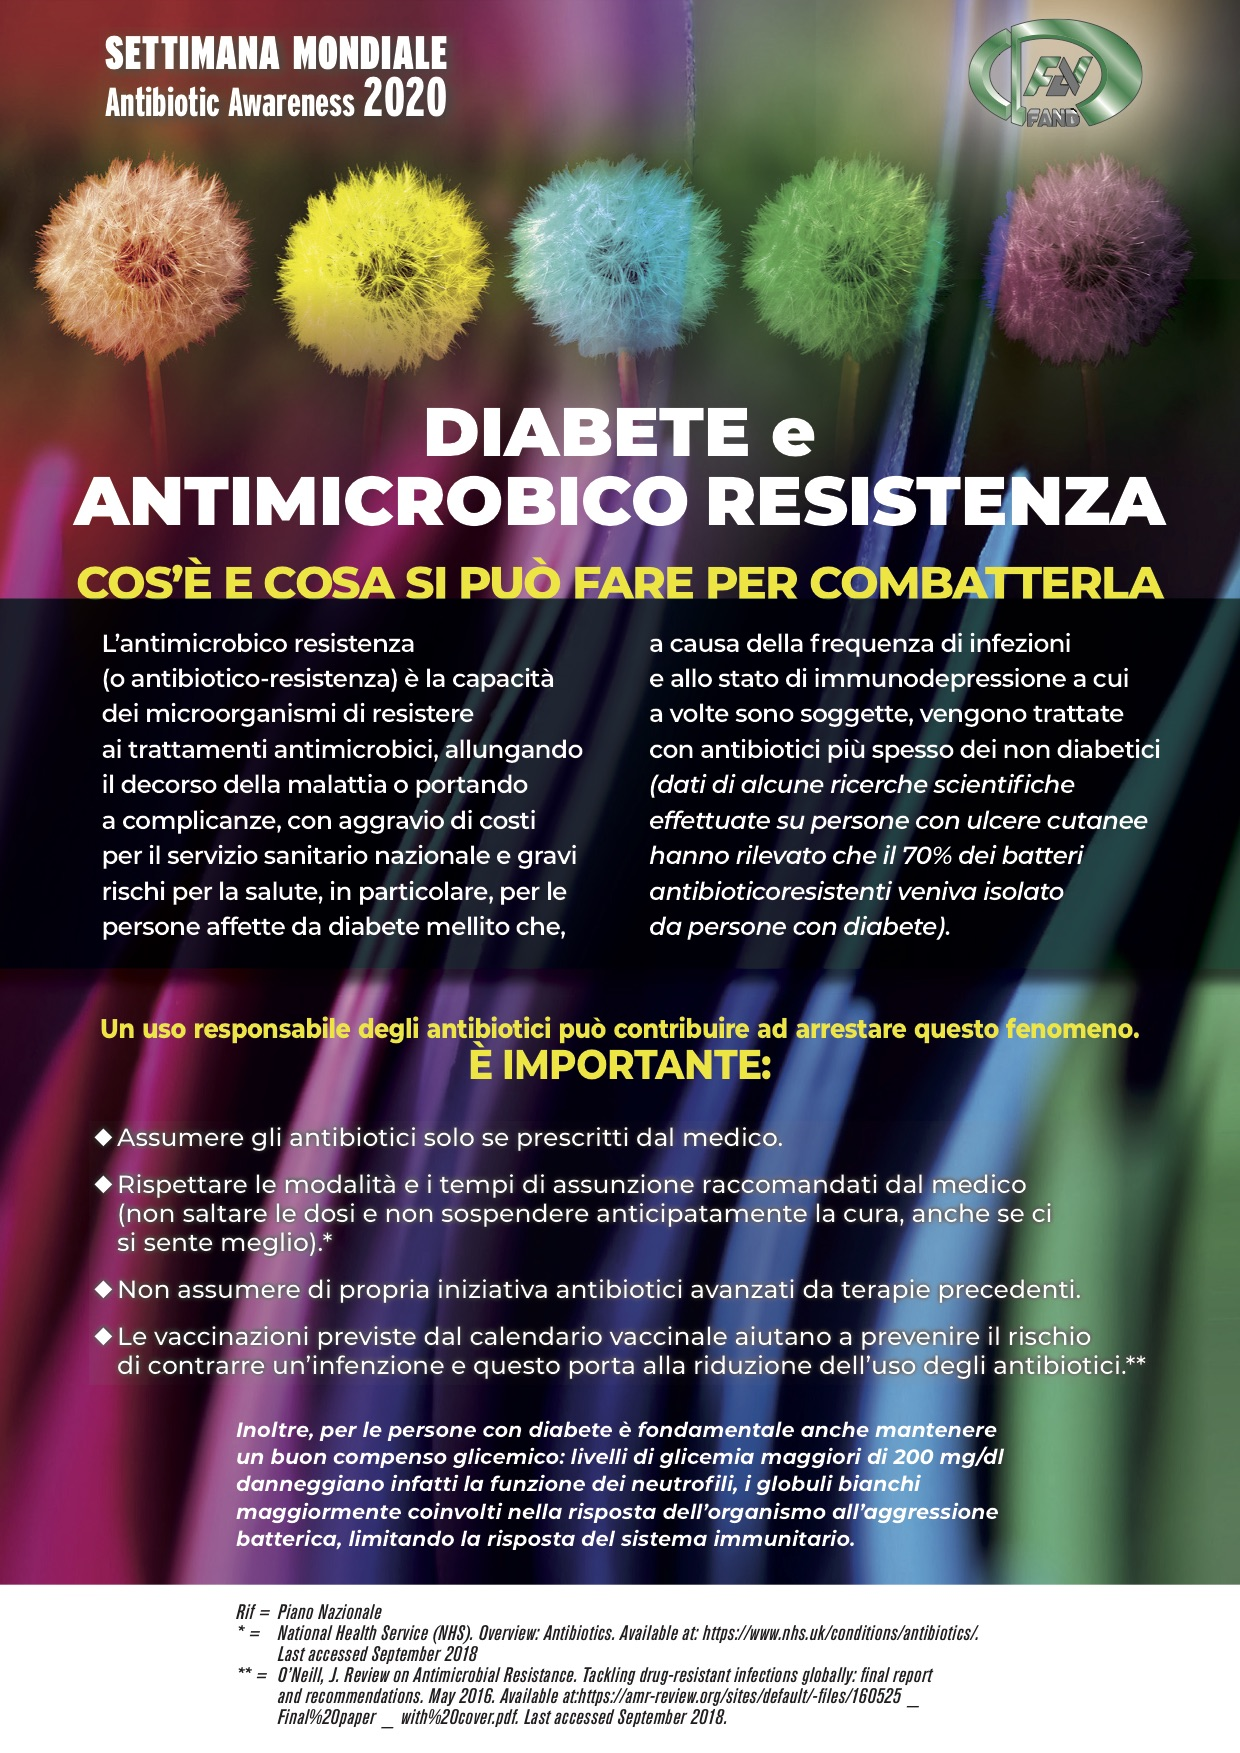 Diabete e antimicrobico resistenza